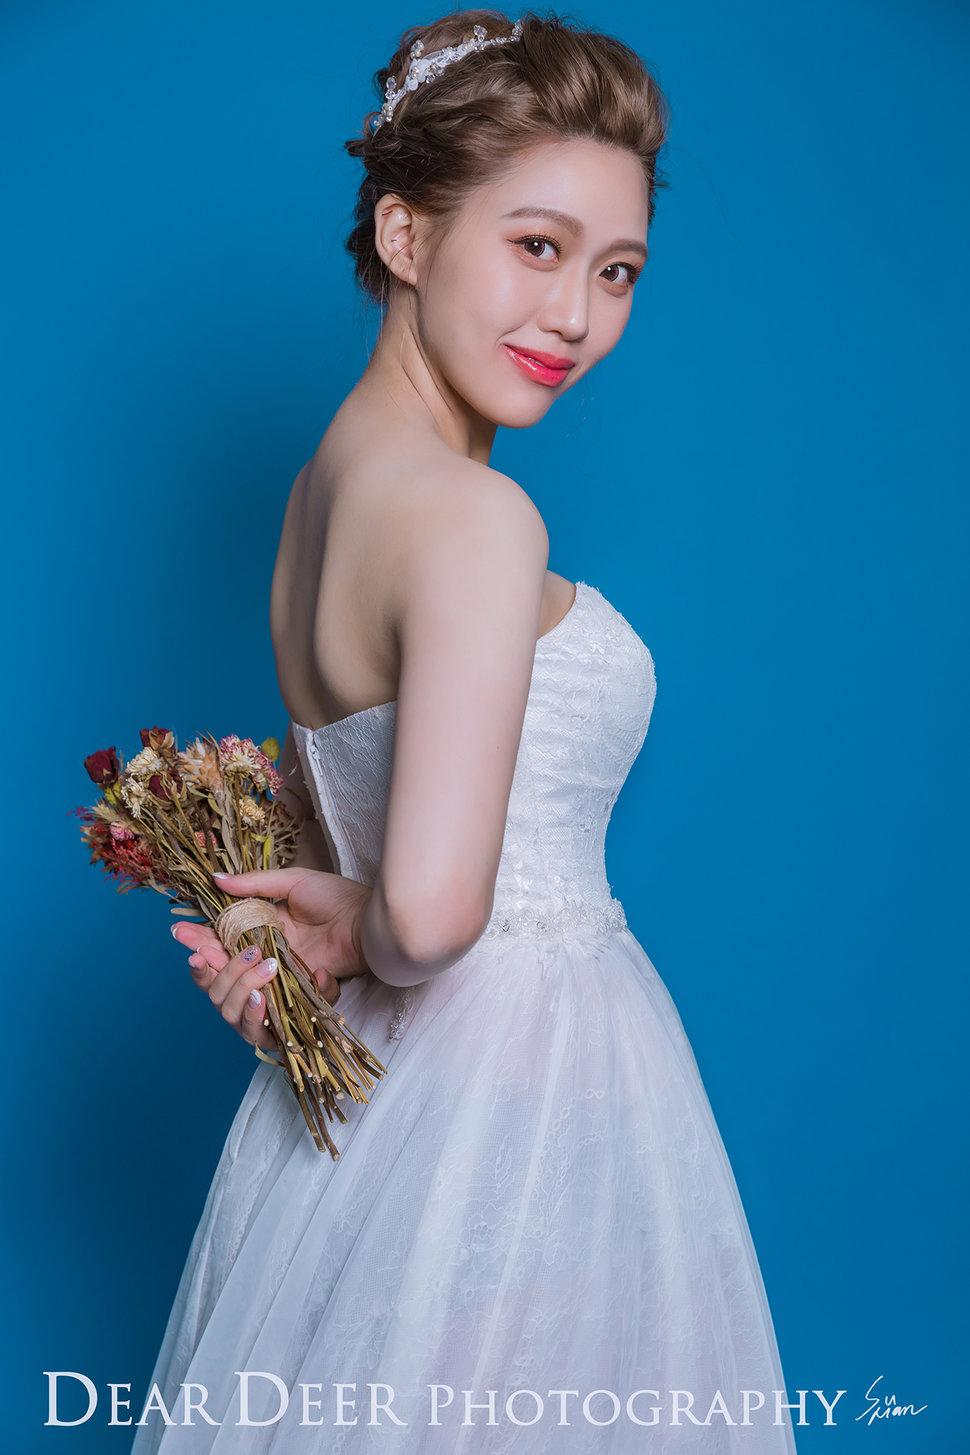 Dear Deer|經典韓系棚拍(編號:2403912) - Dear Deer鹿兒攝影|女攝影師蘇蔓 - 結婚吧